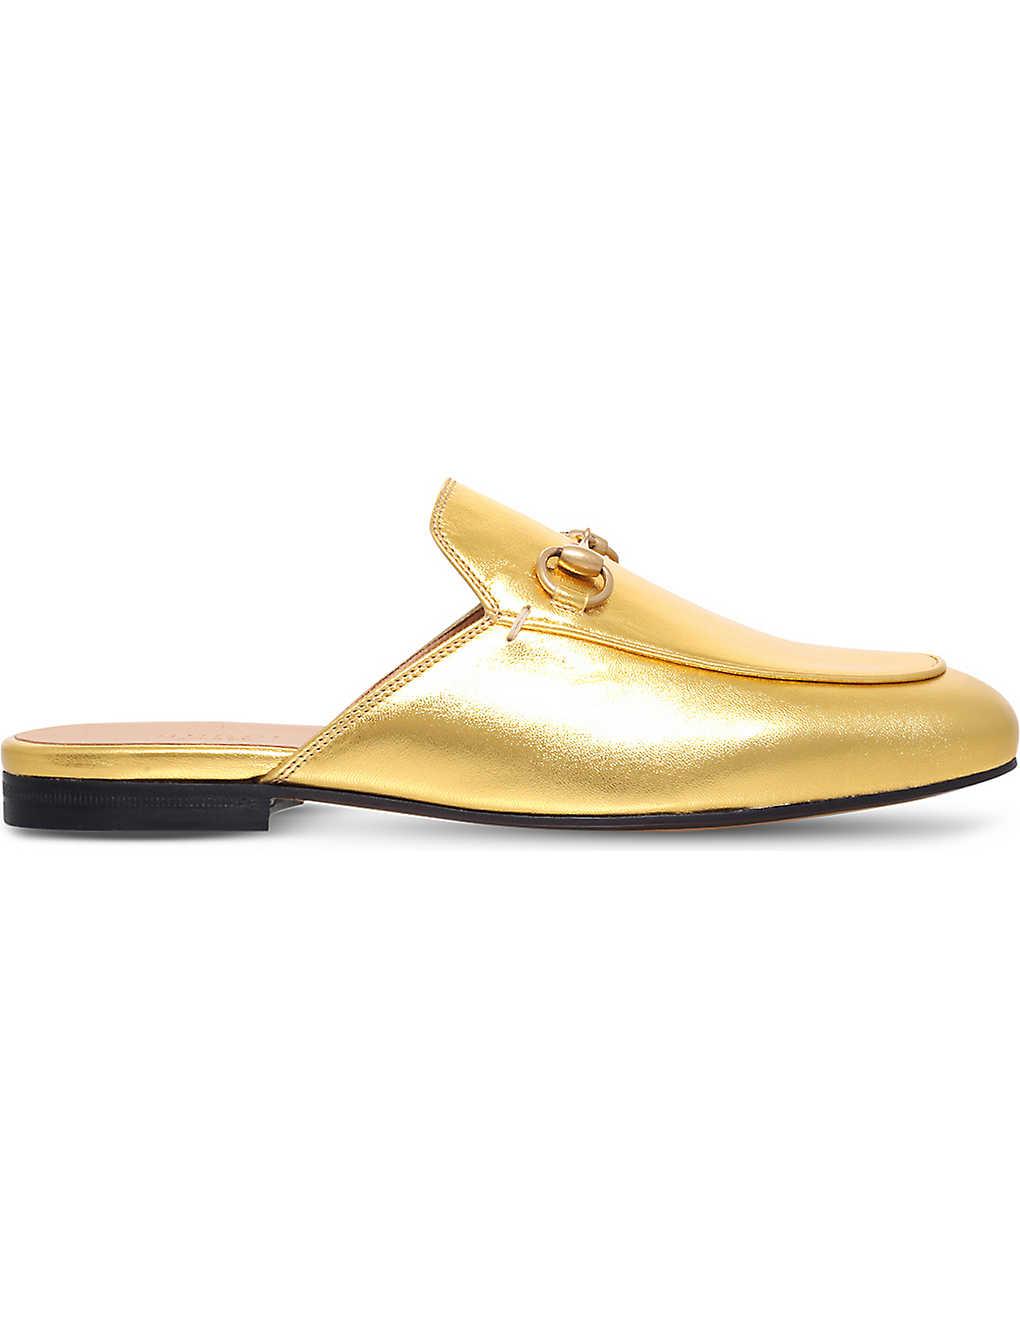 ff8656f9d63 GUCCI - Princetown leather slipper